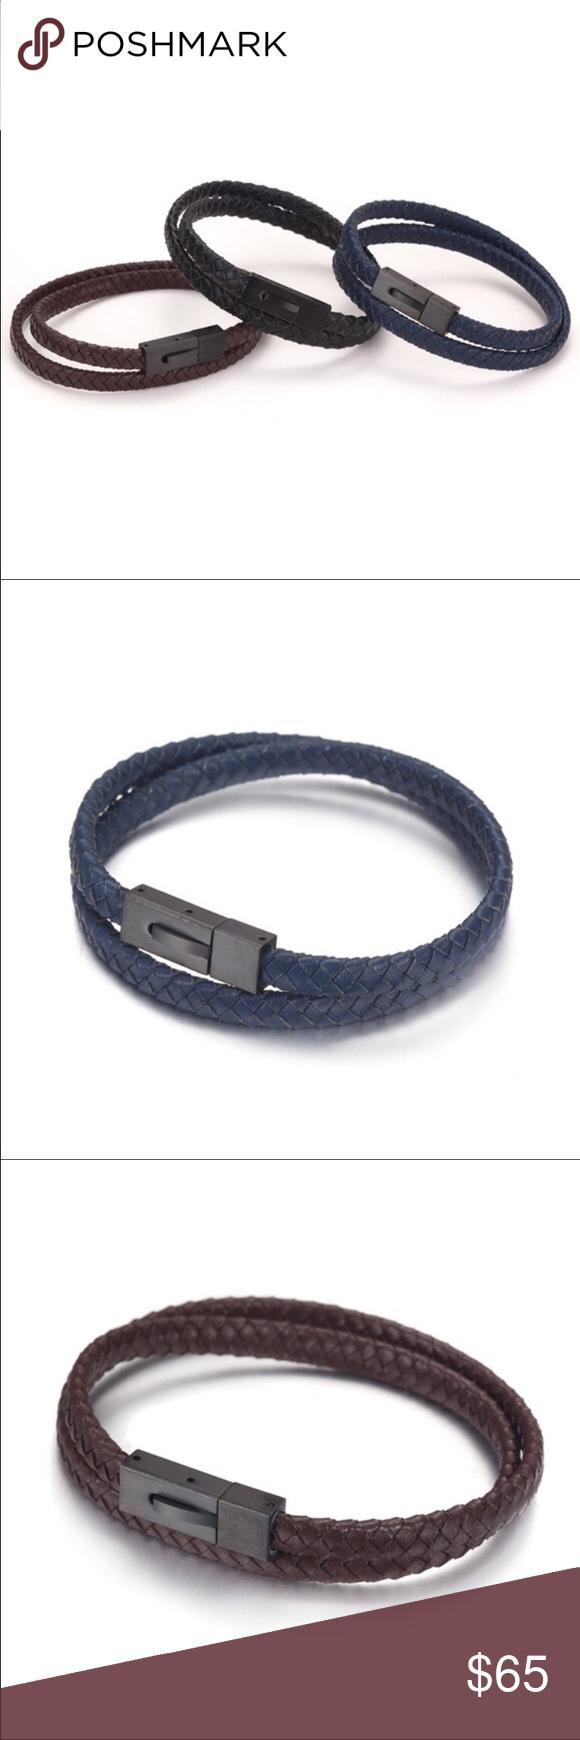 Menus bracelet nwt my posh closet pinterest bracelets